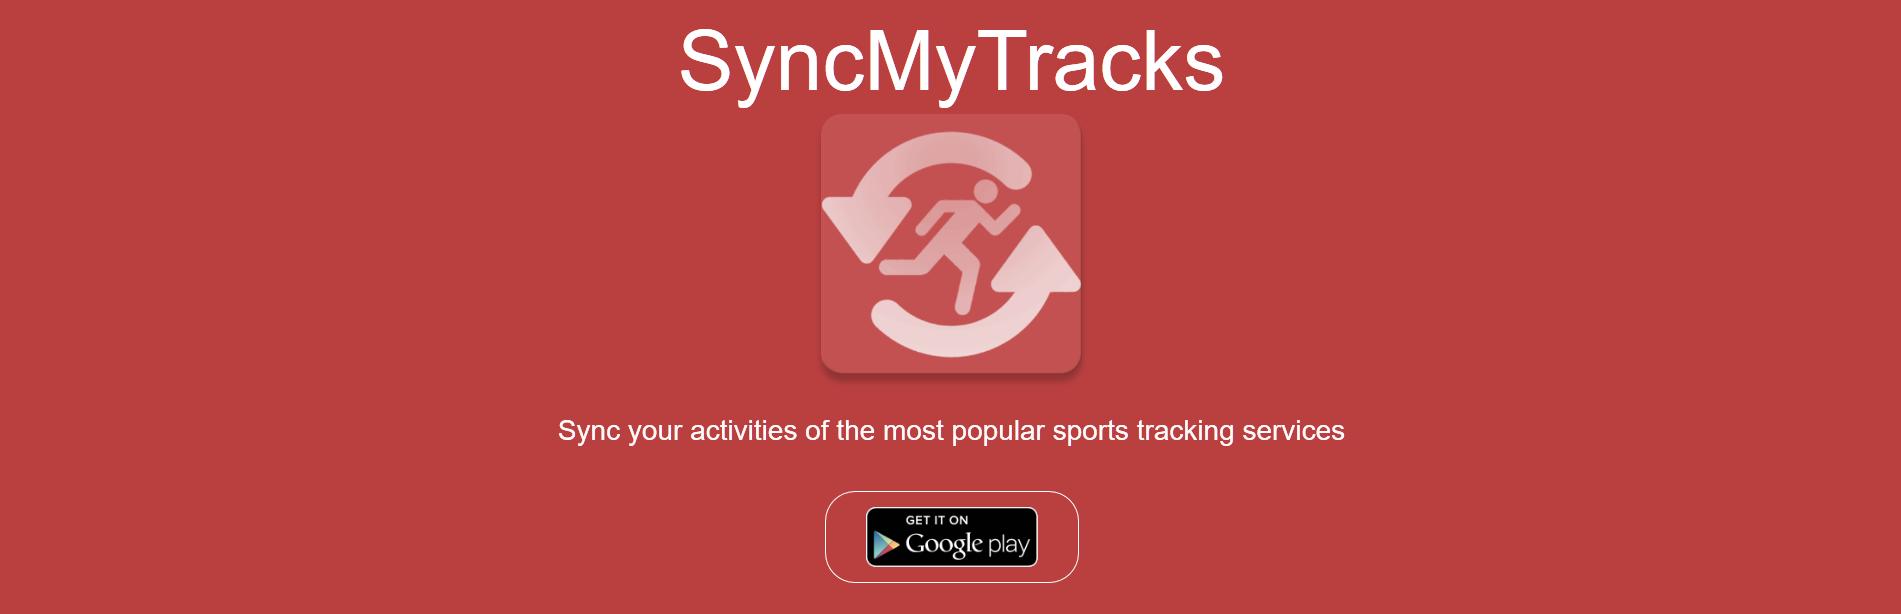 SyncMyTracks